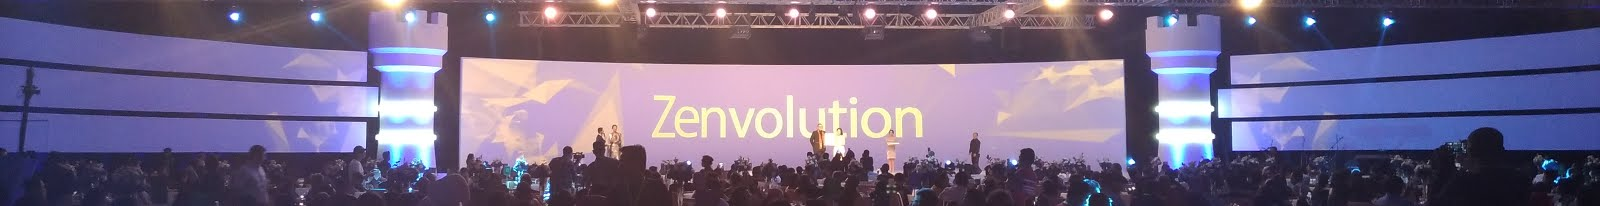 Asus Zenvolution 2016